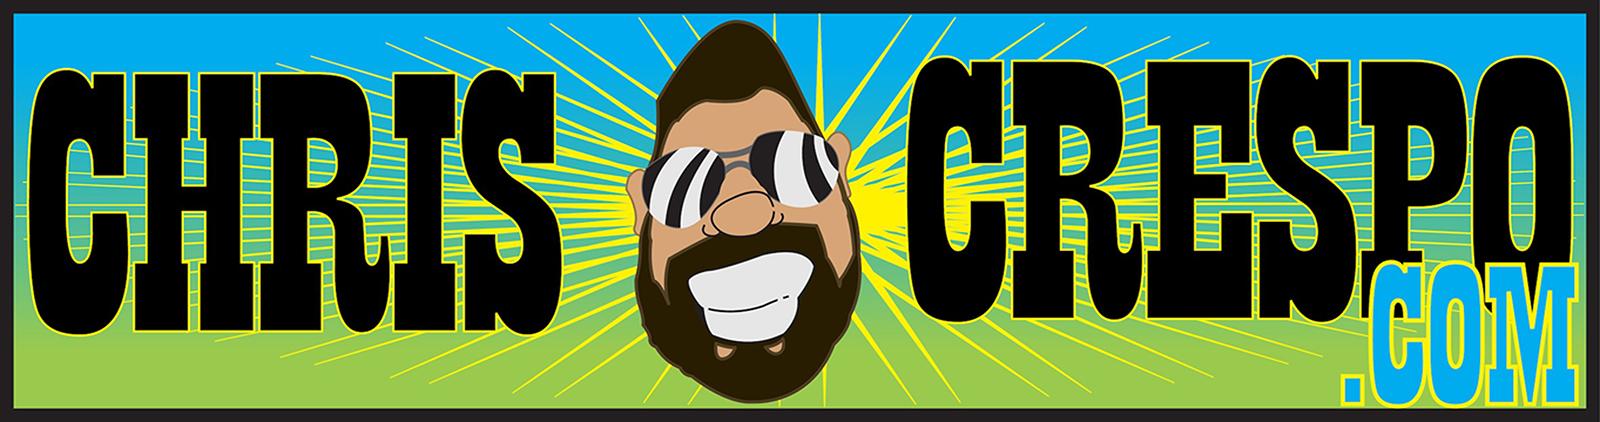 Chris Crespo Header_Cinema Crespodiso_Orlando Movie Critic_Movie Podcast_Orlando Radio